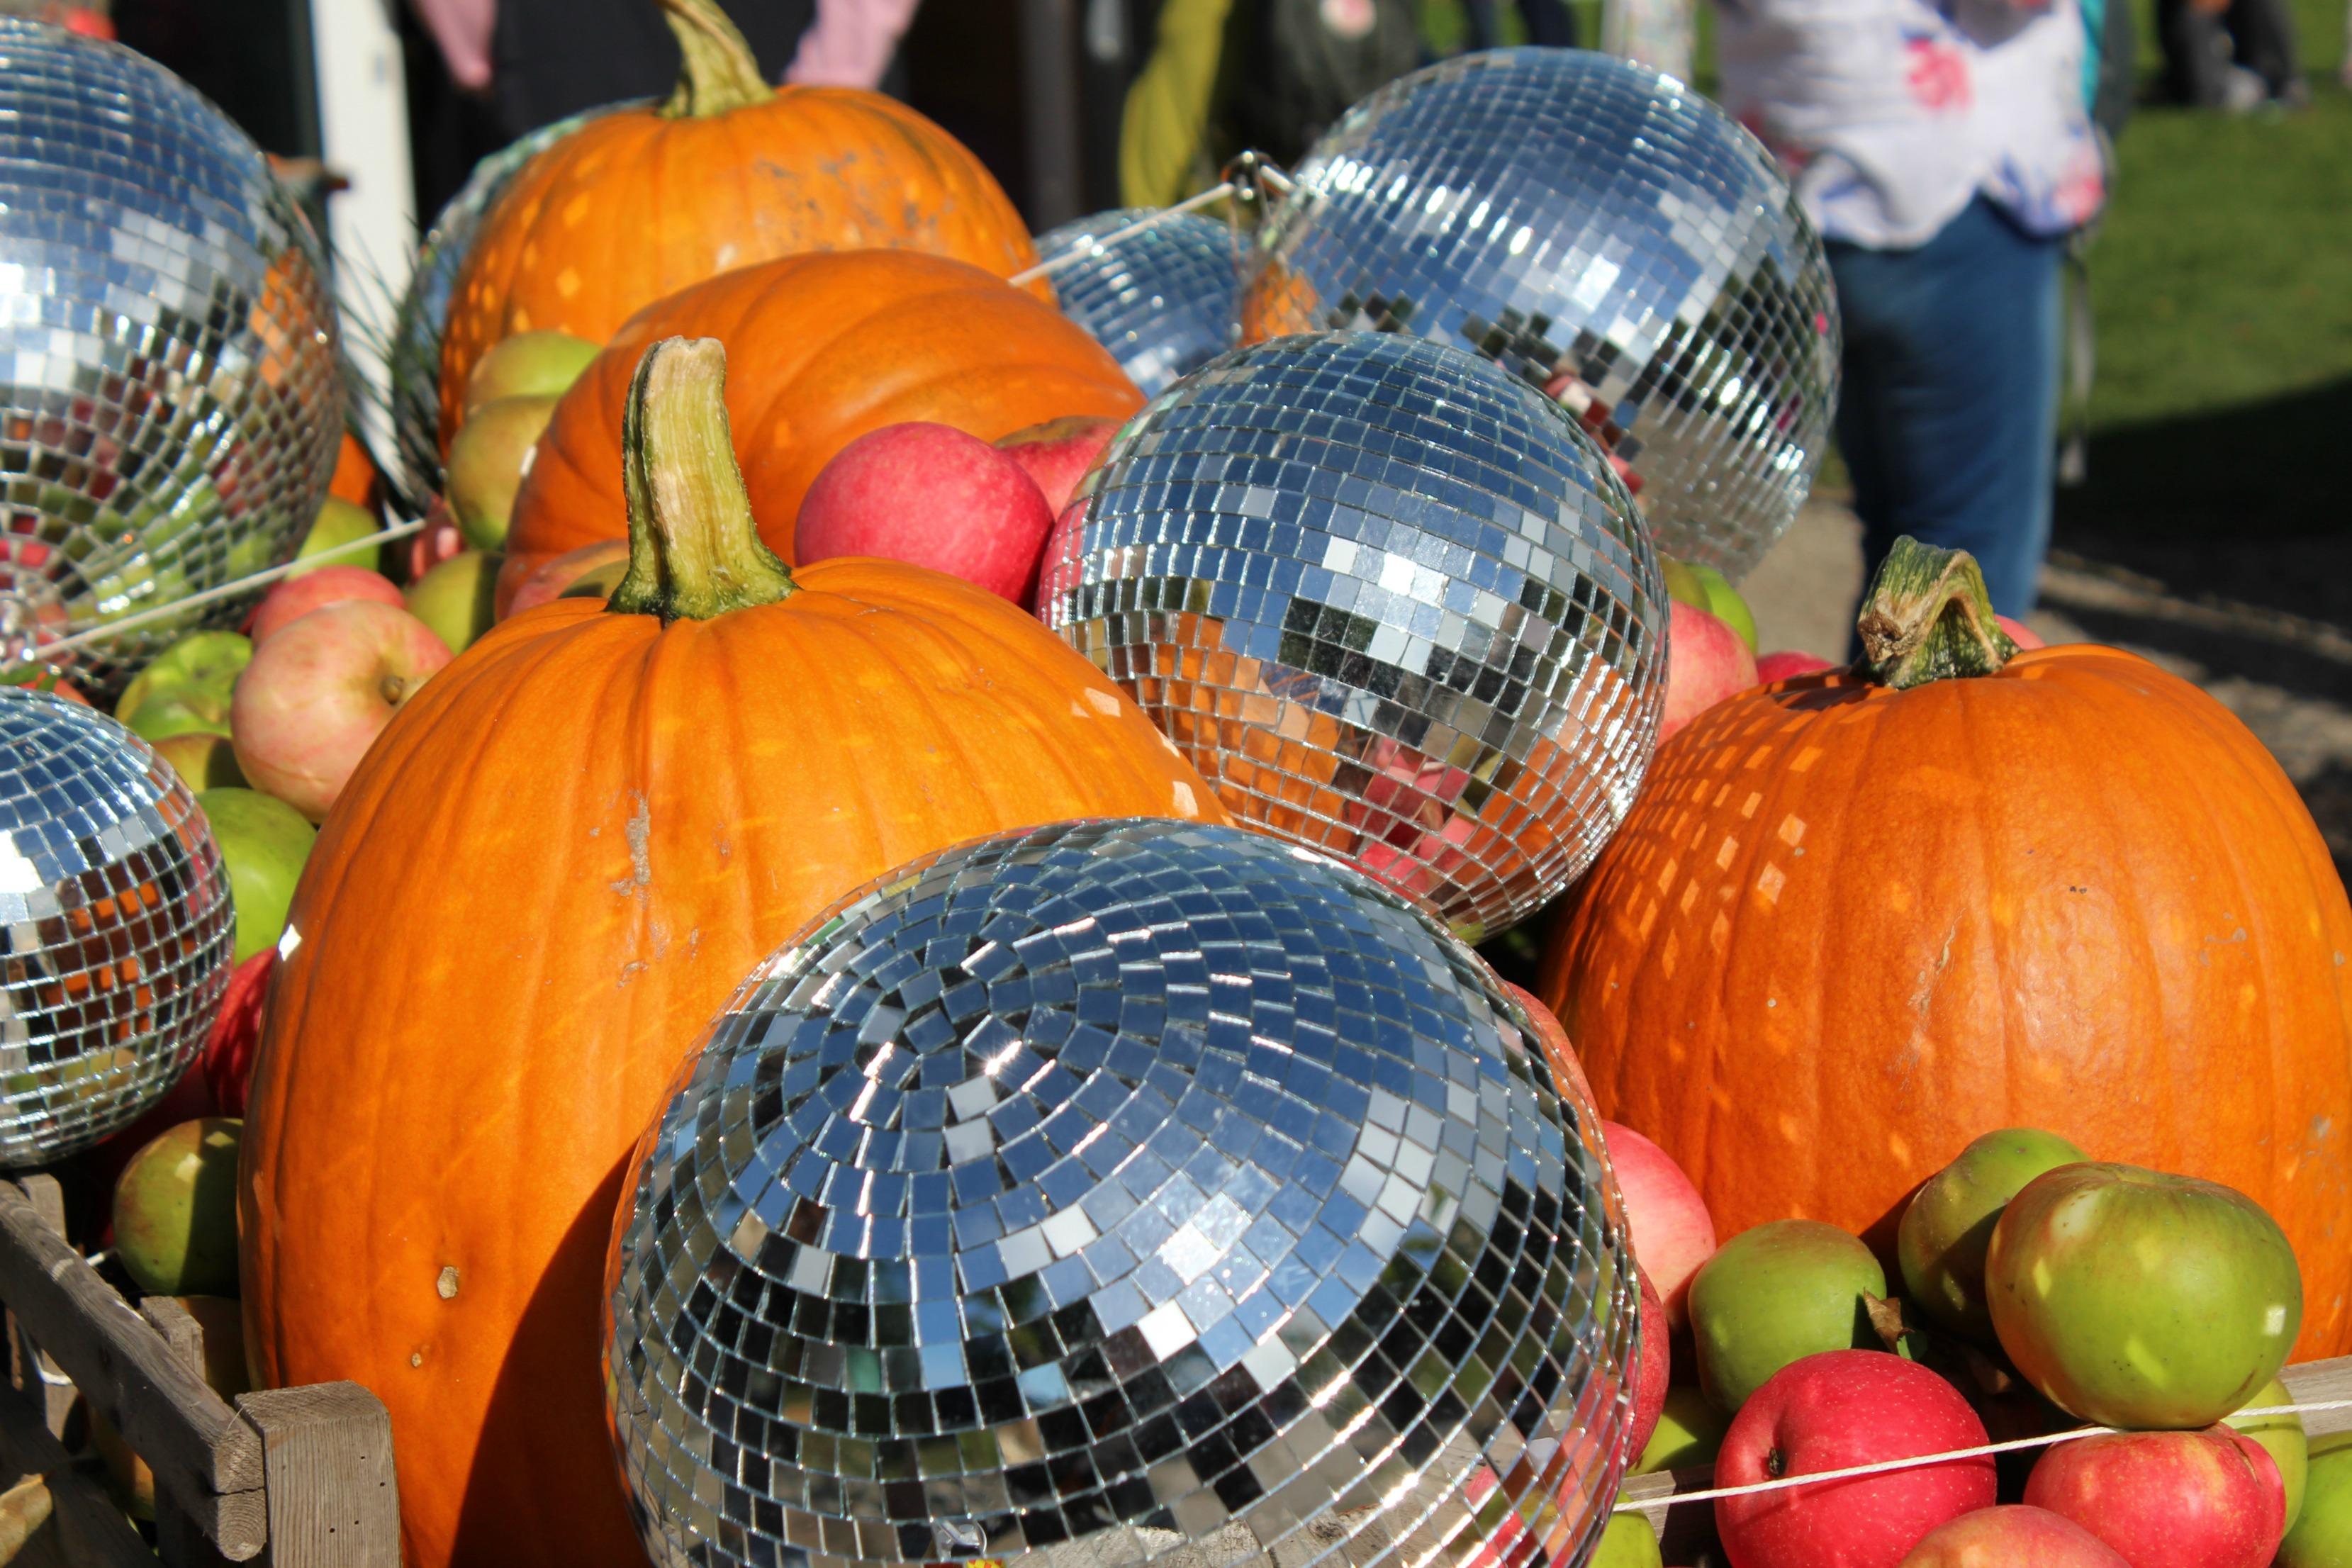 disco-balls-and-pumpkins-good-life-experience-61